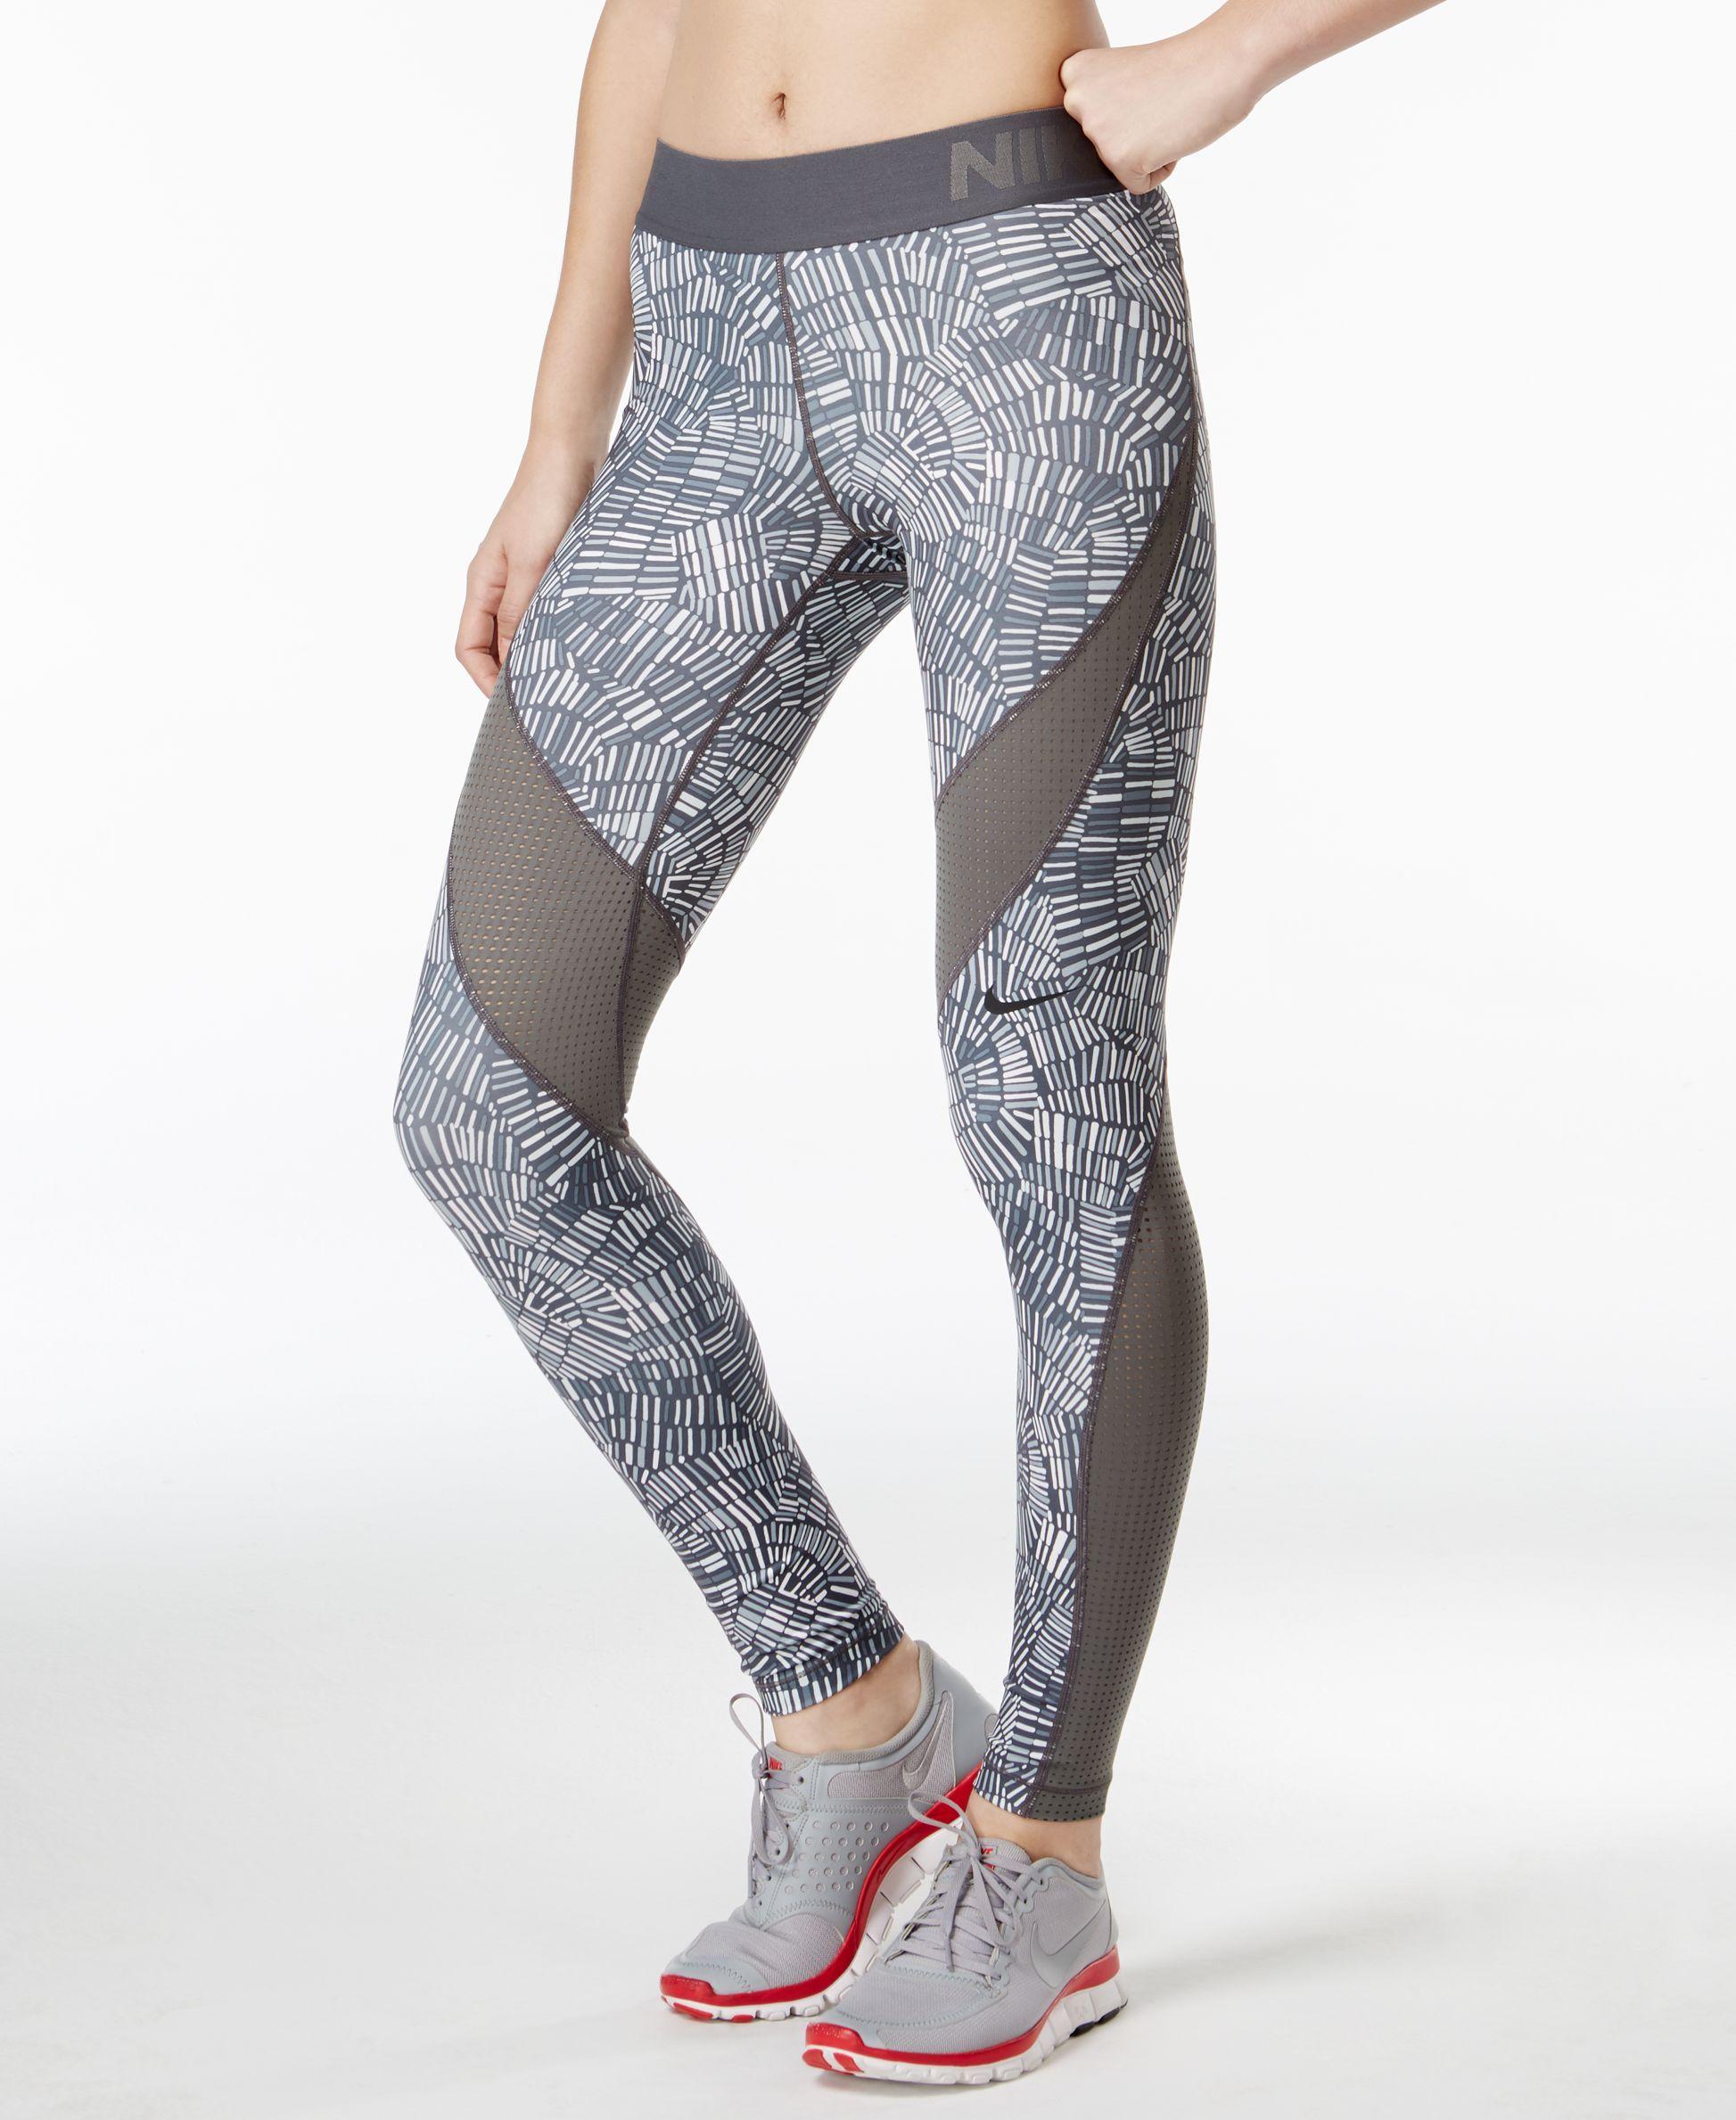 c35eef41ec5563 Nike Pro Hypercool Dri-fit Tidal Multi Print Leggings | Athlete/in ...